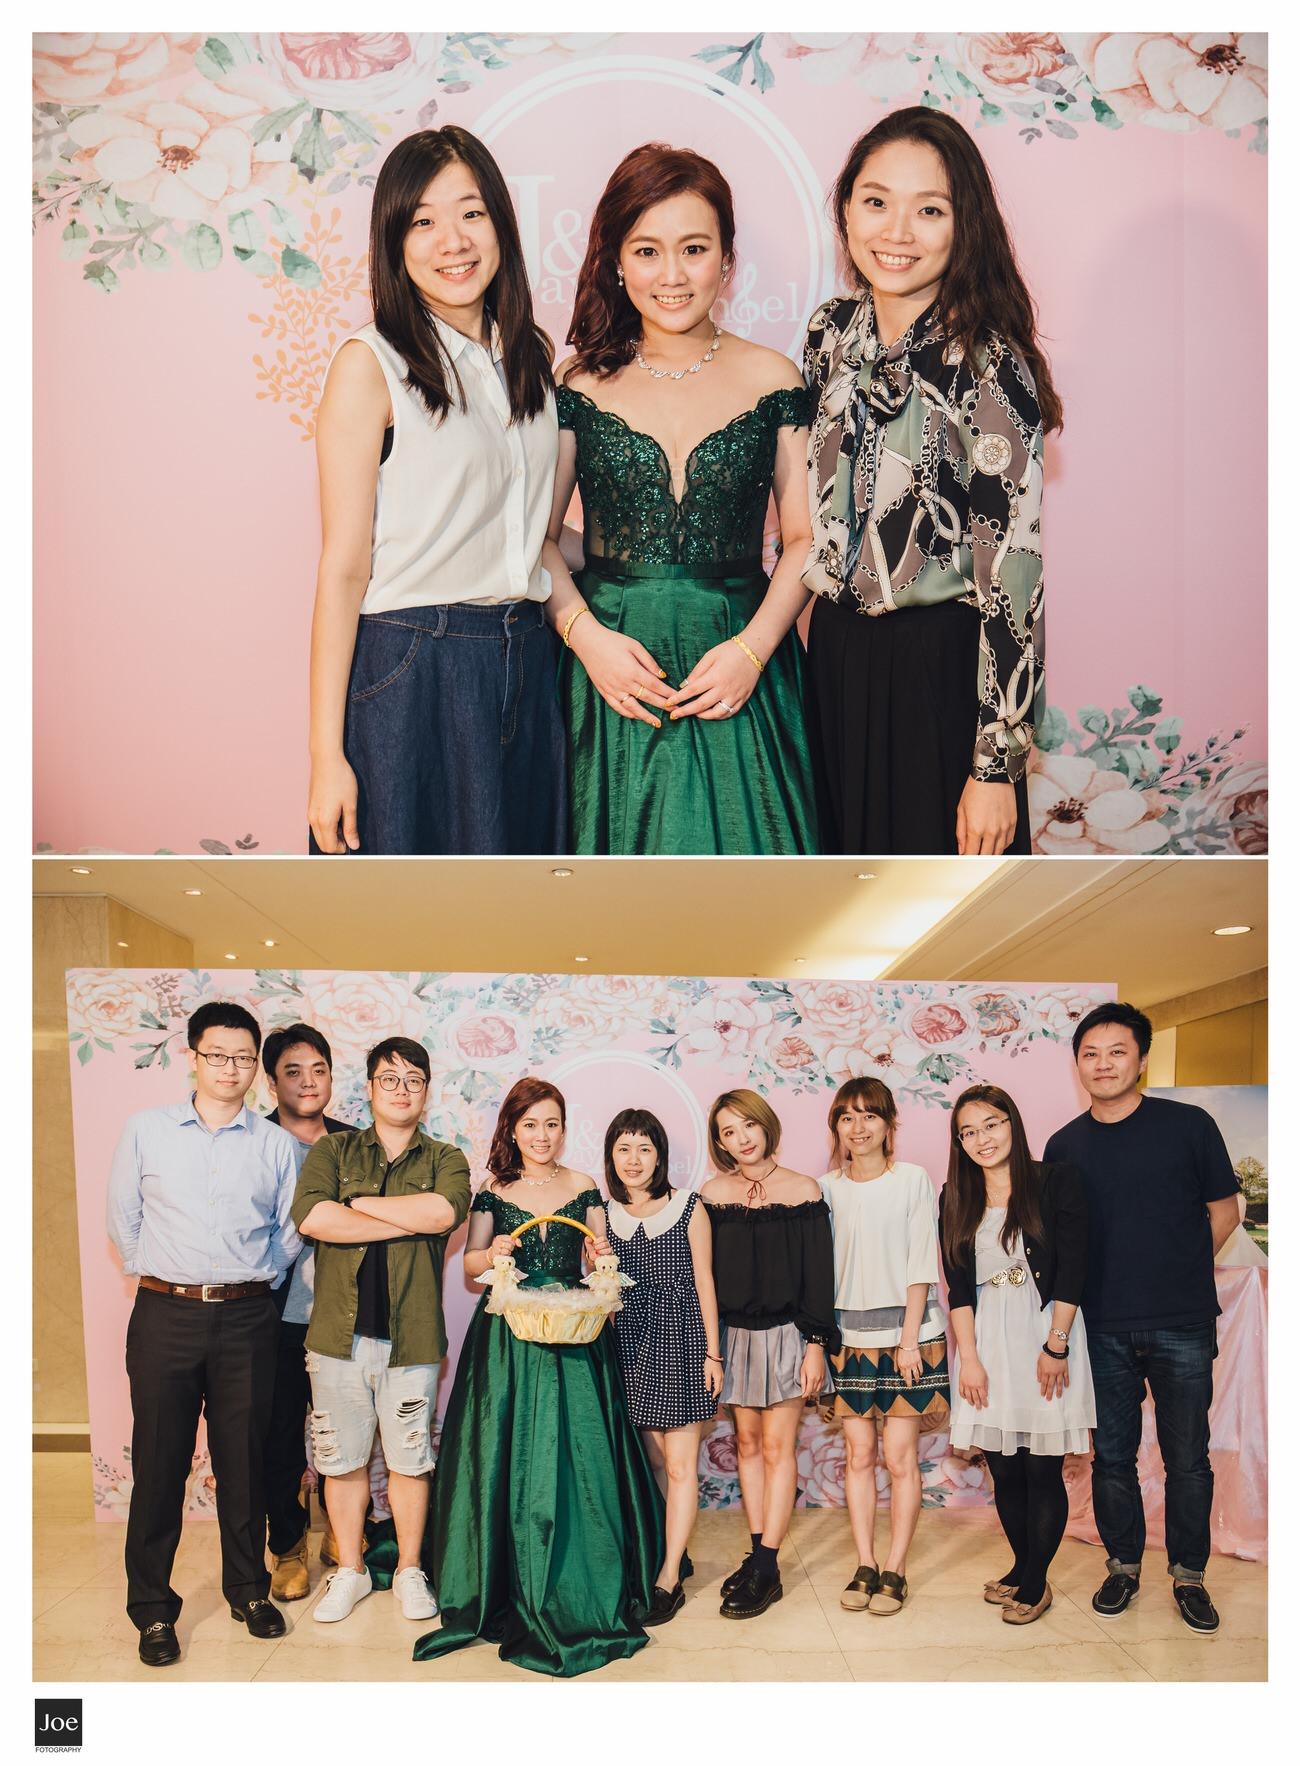 sunworld-dynasty-hotel-taipei-wedding-photo-joe-fotography-angel-jay-120.jpg